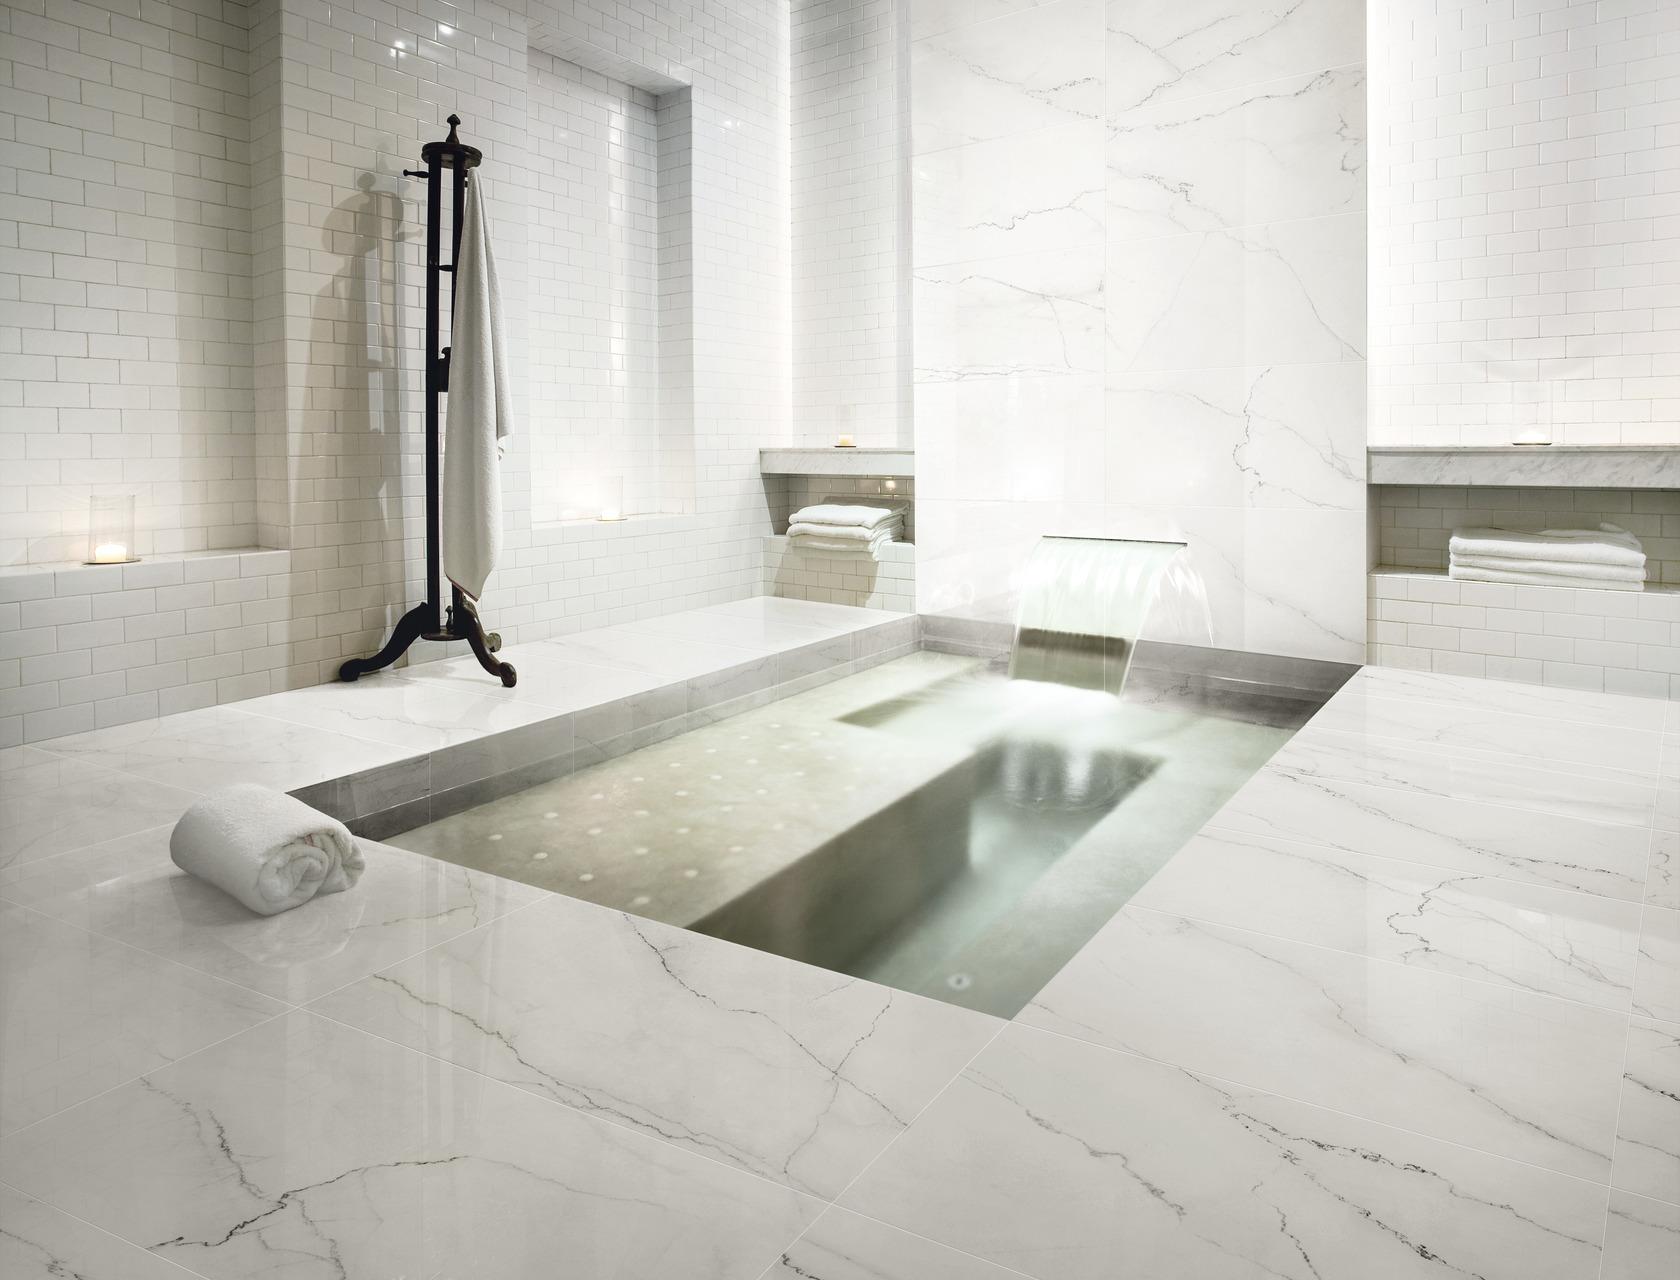 Feinsteinzeug marmor effekt klassische murmeln ariostea böden